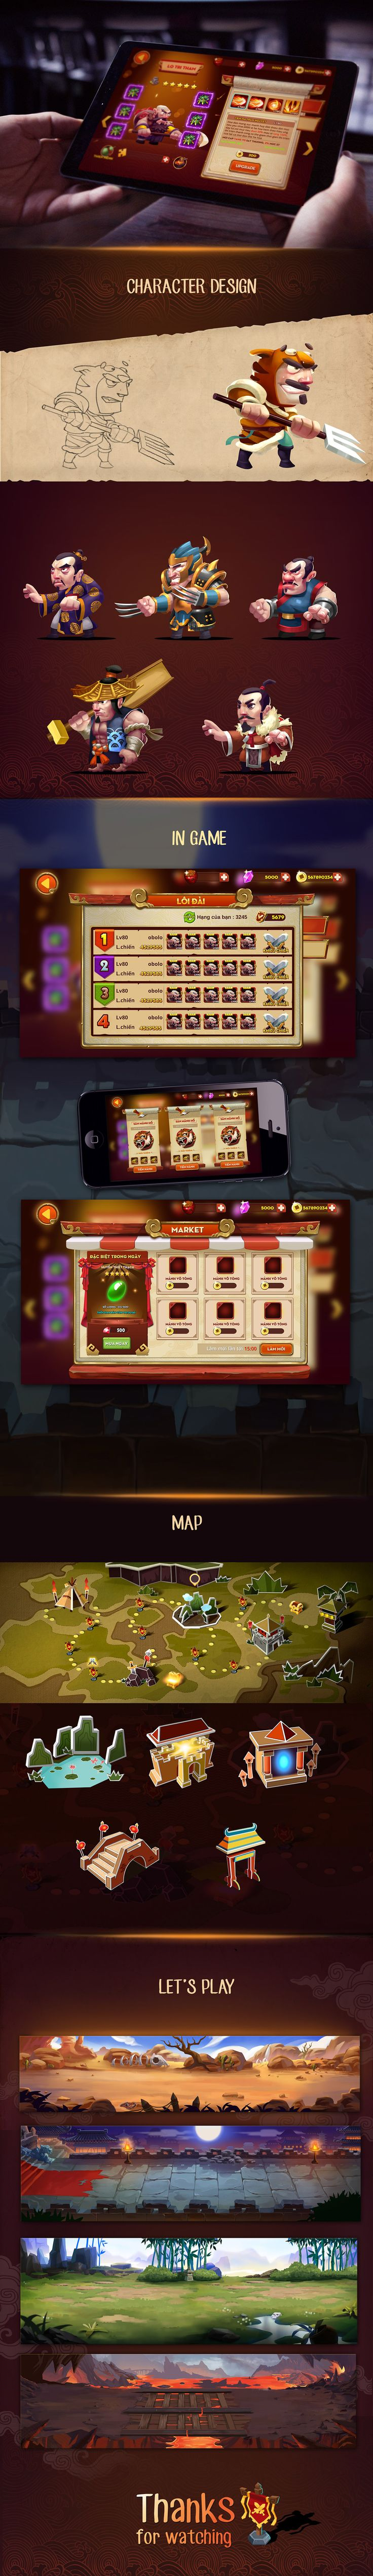 Ознакомьтесь с этим проектом @Behance: «Thuy Hu - Mobile Game» https://www.behance.net/gallery/31604485/Thuy-Hu-Mobile-Game